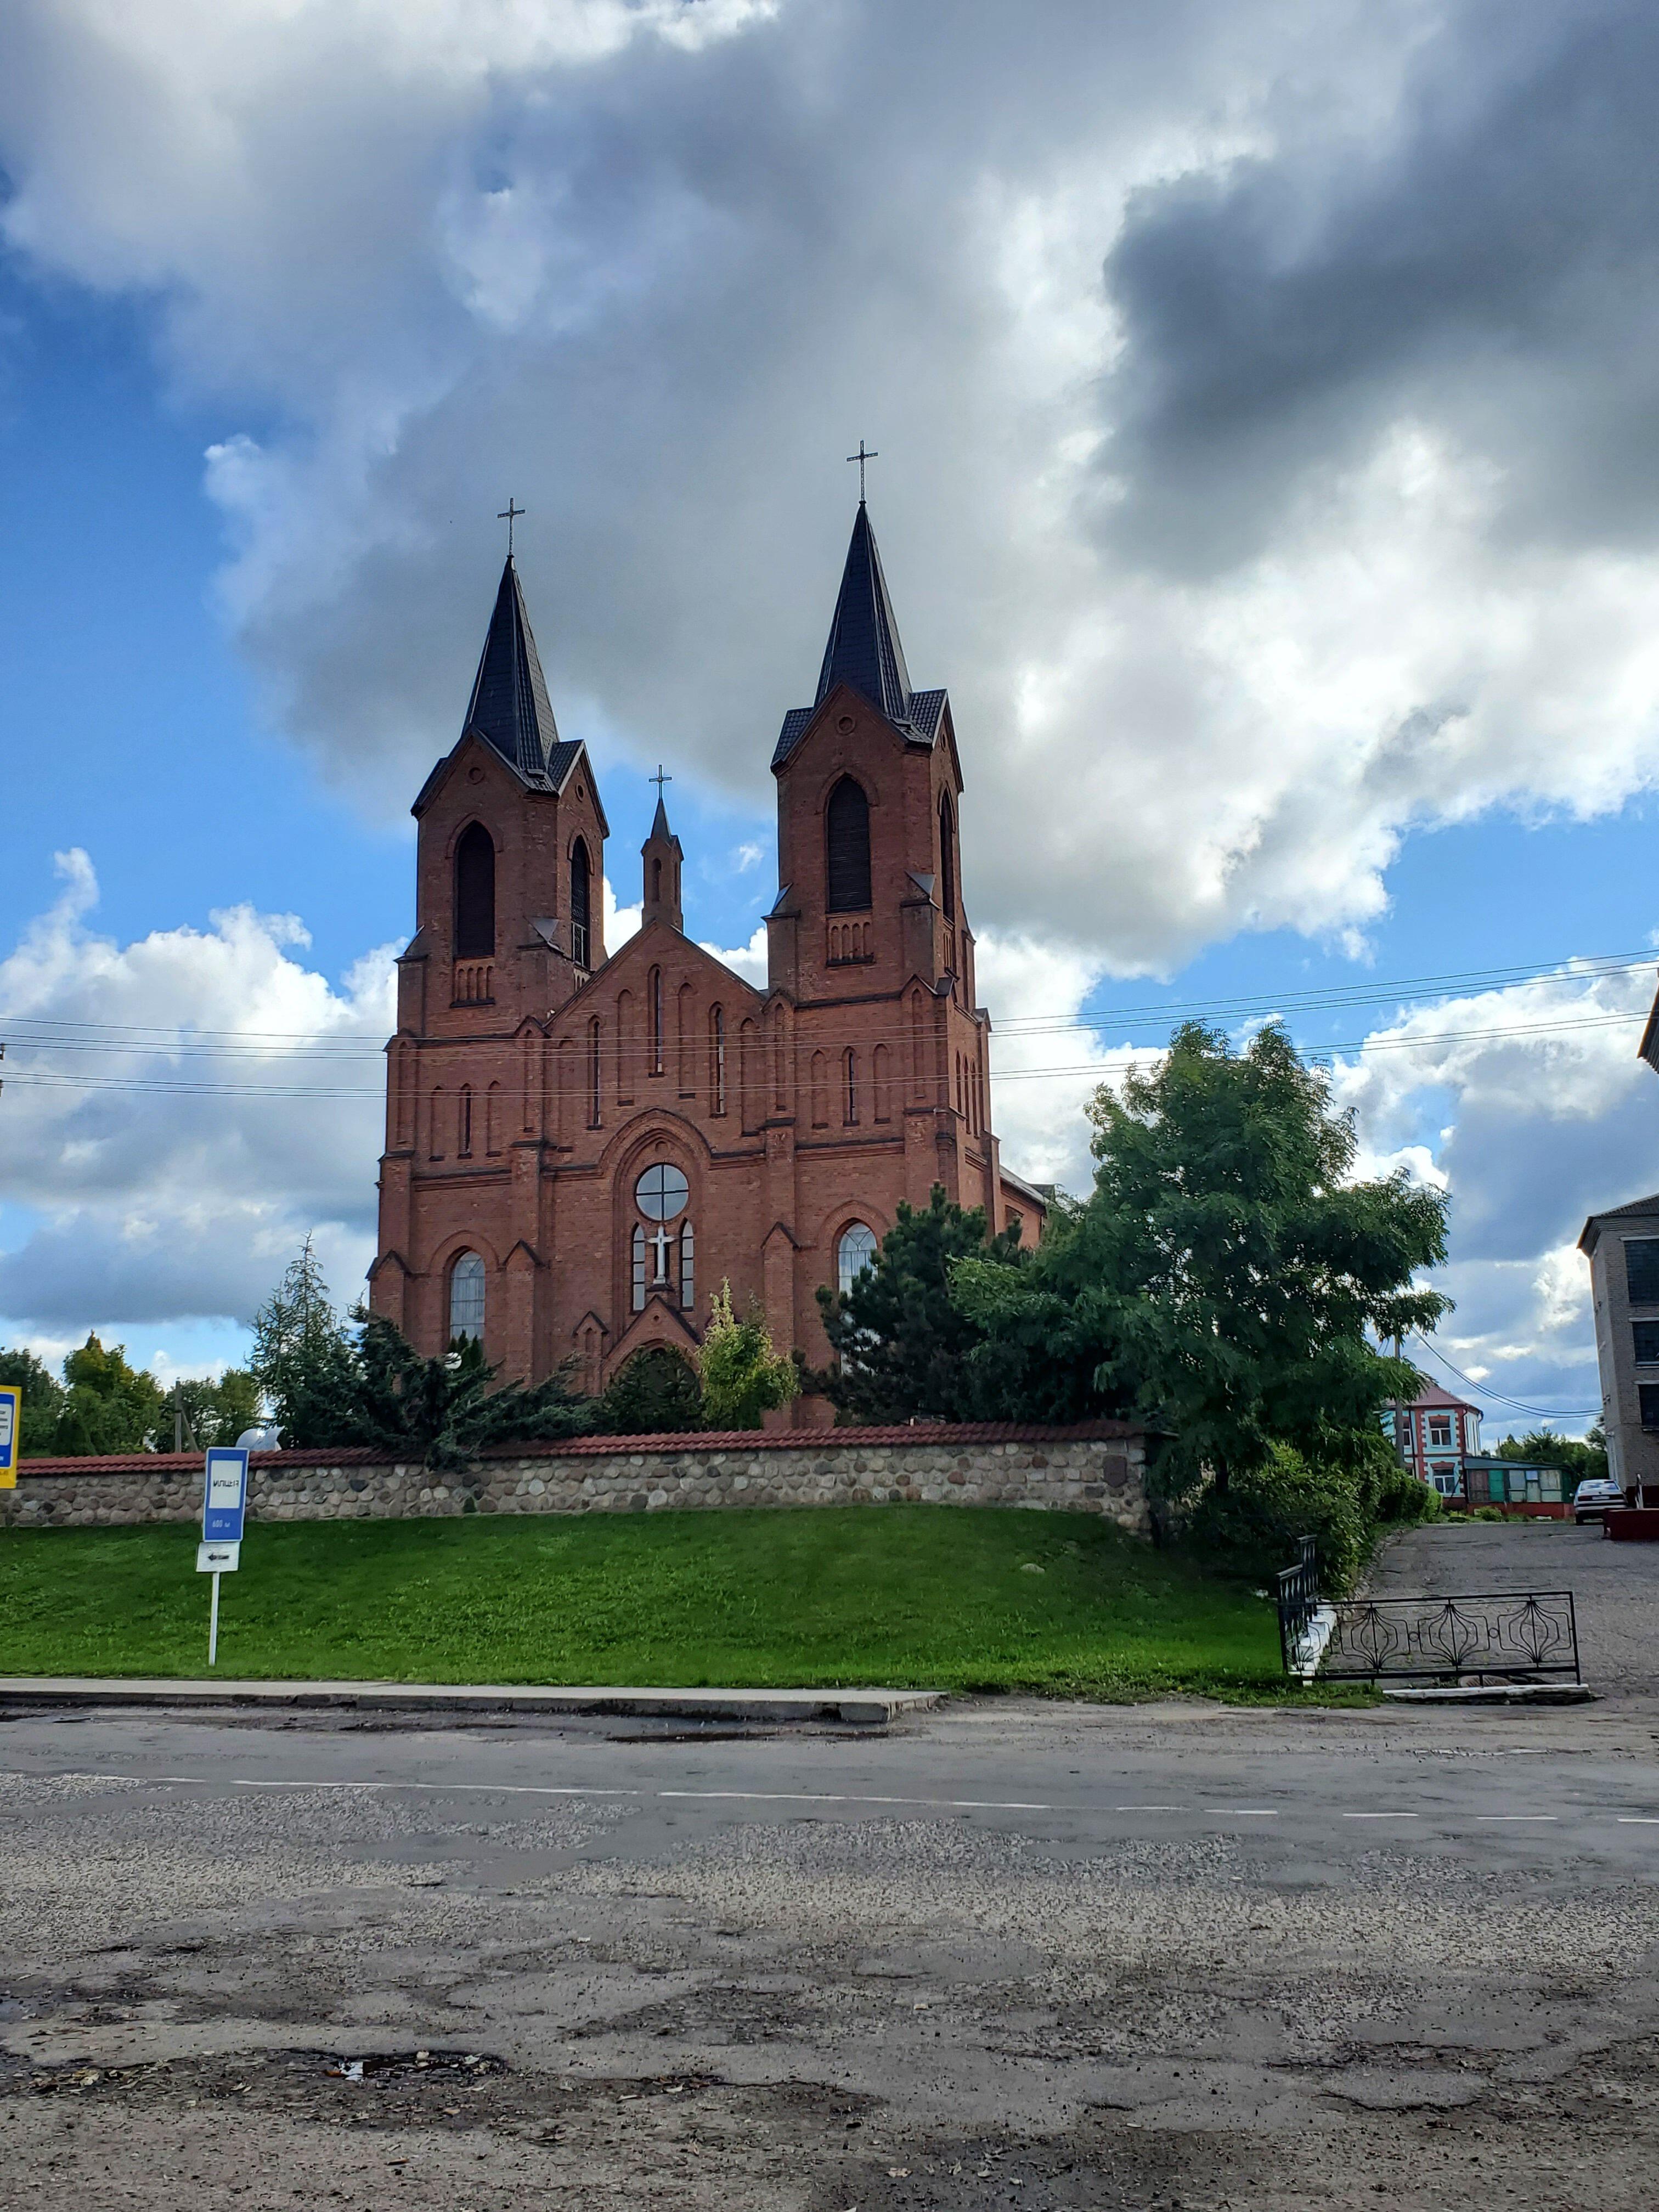 20210904 113223 rotated - Успенский костел в Миорах